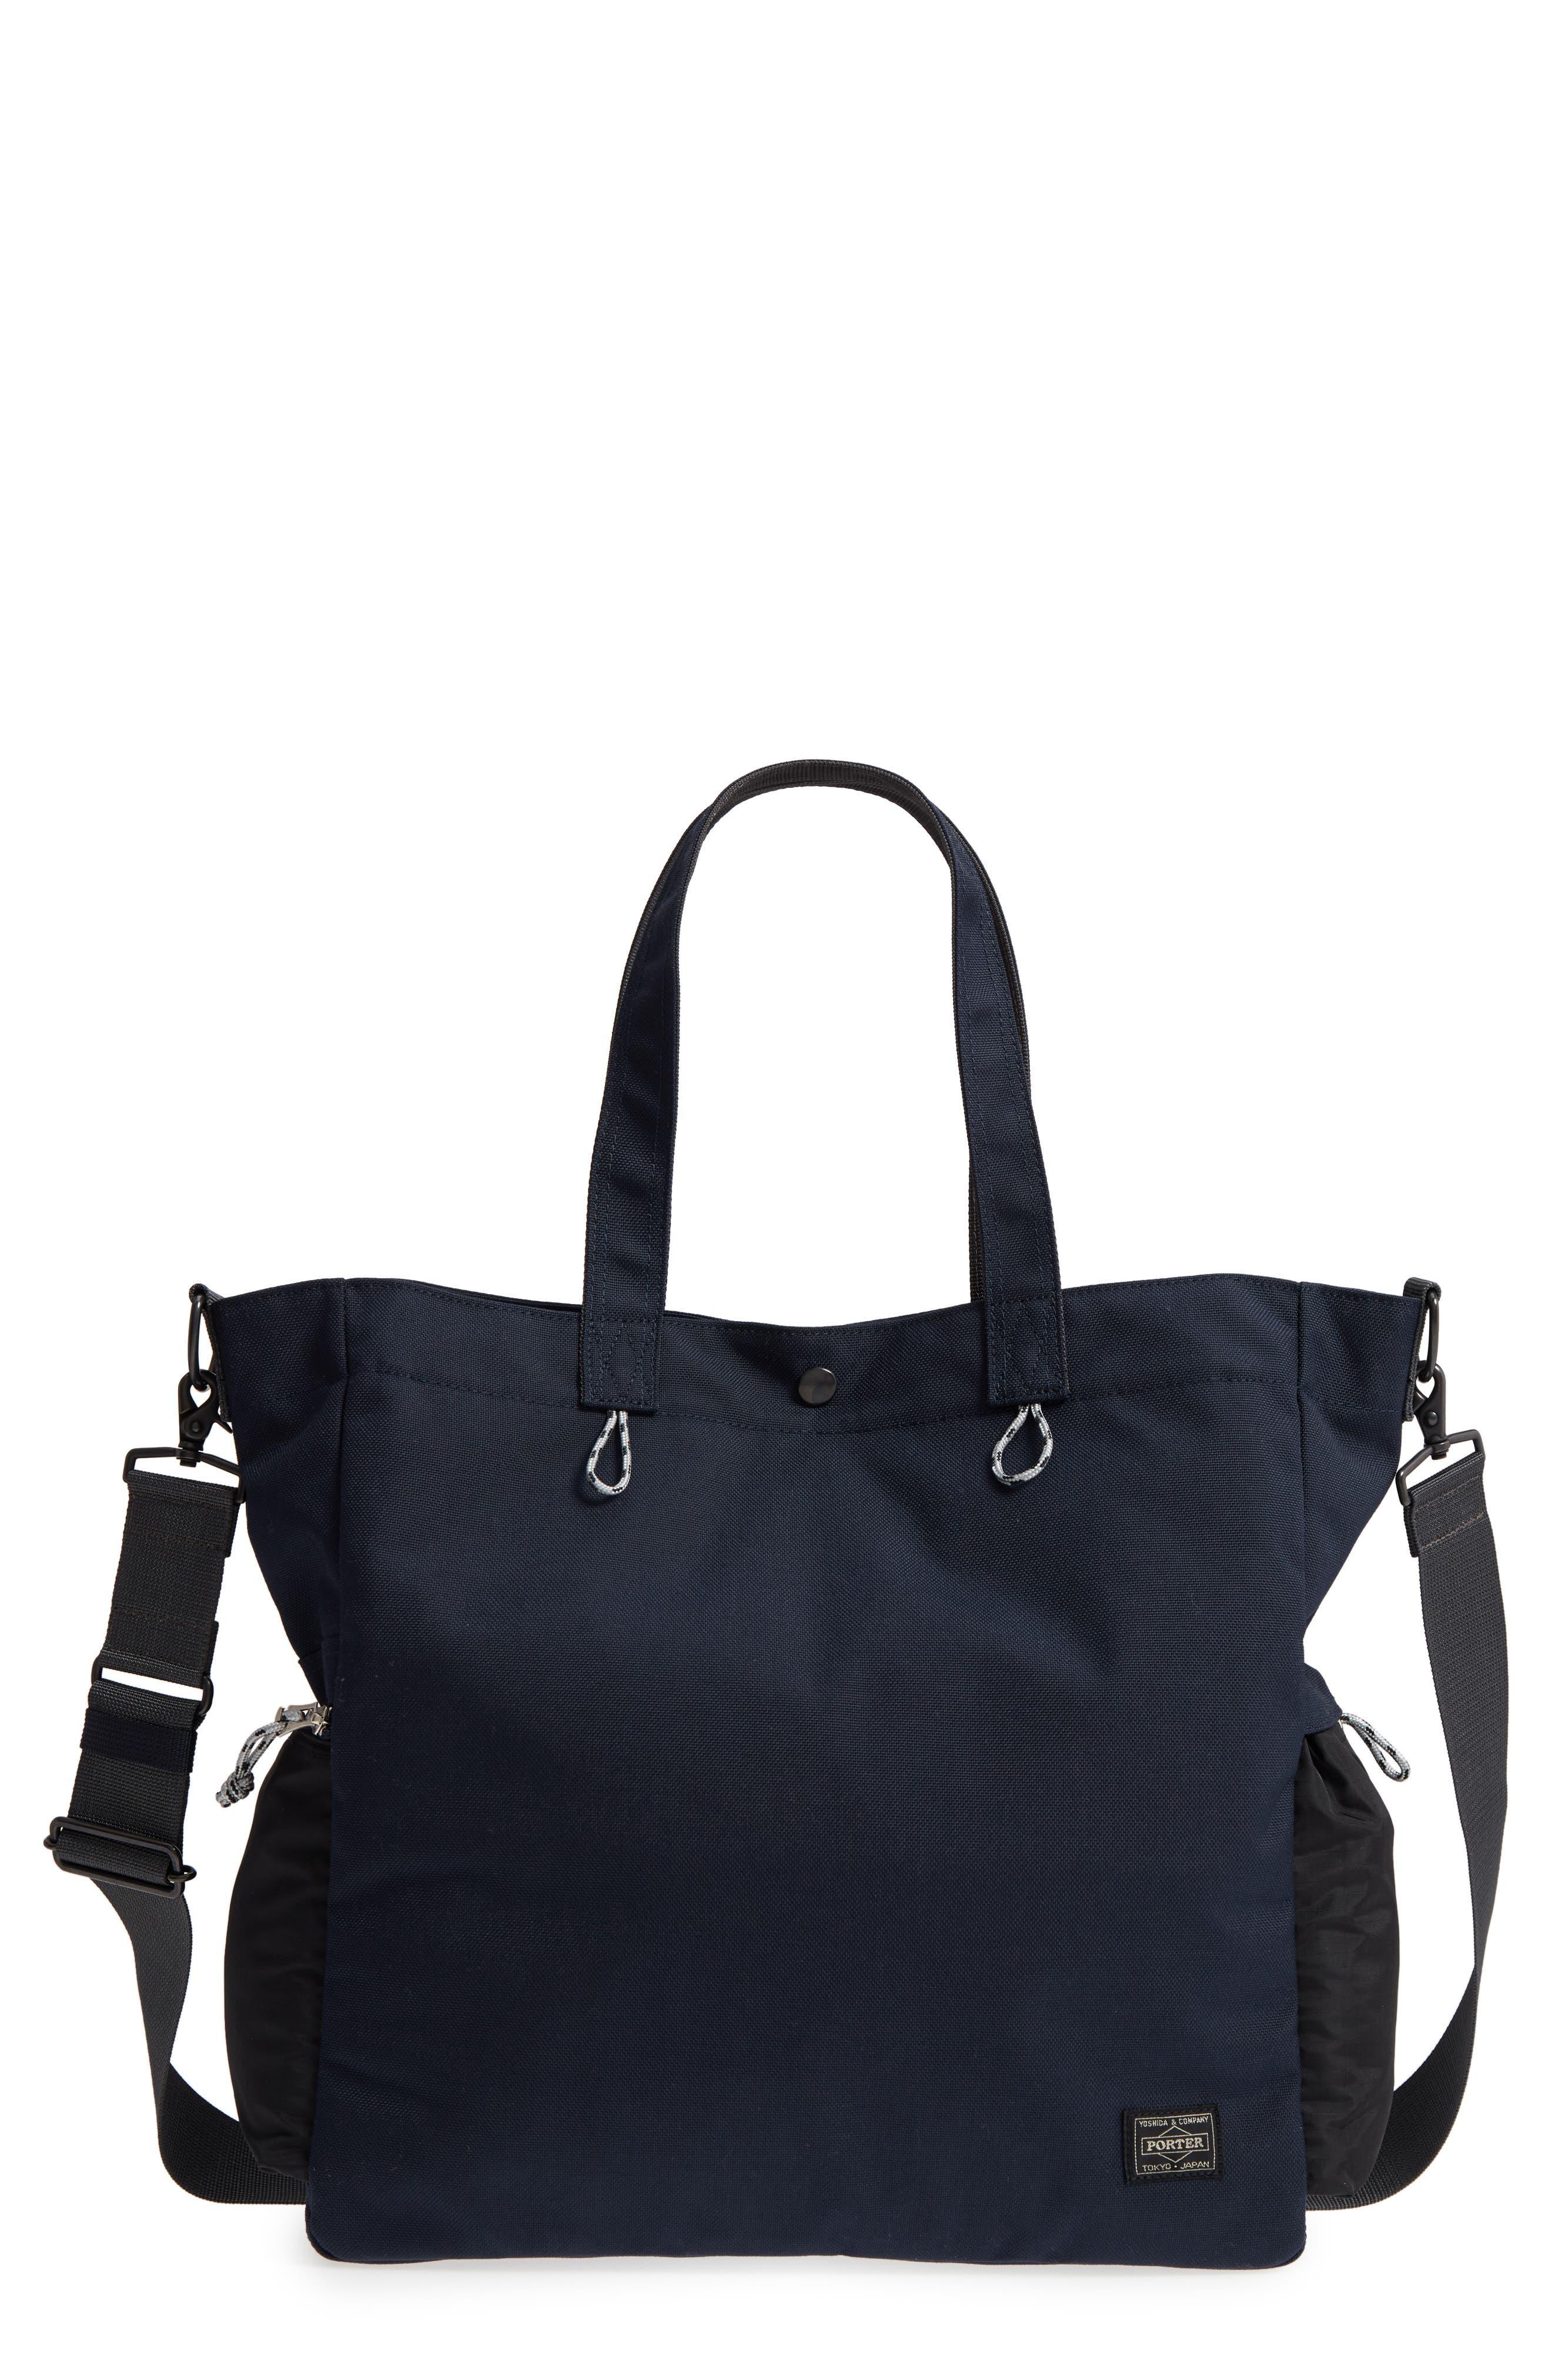 Porter-Yoshida & Co. Hype Tote Bag,                             Main thumbnail 1, color,                             400